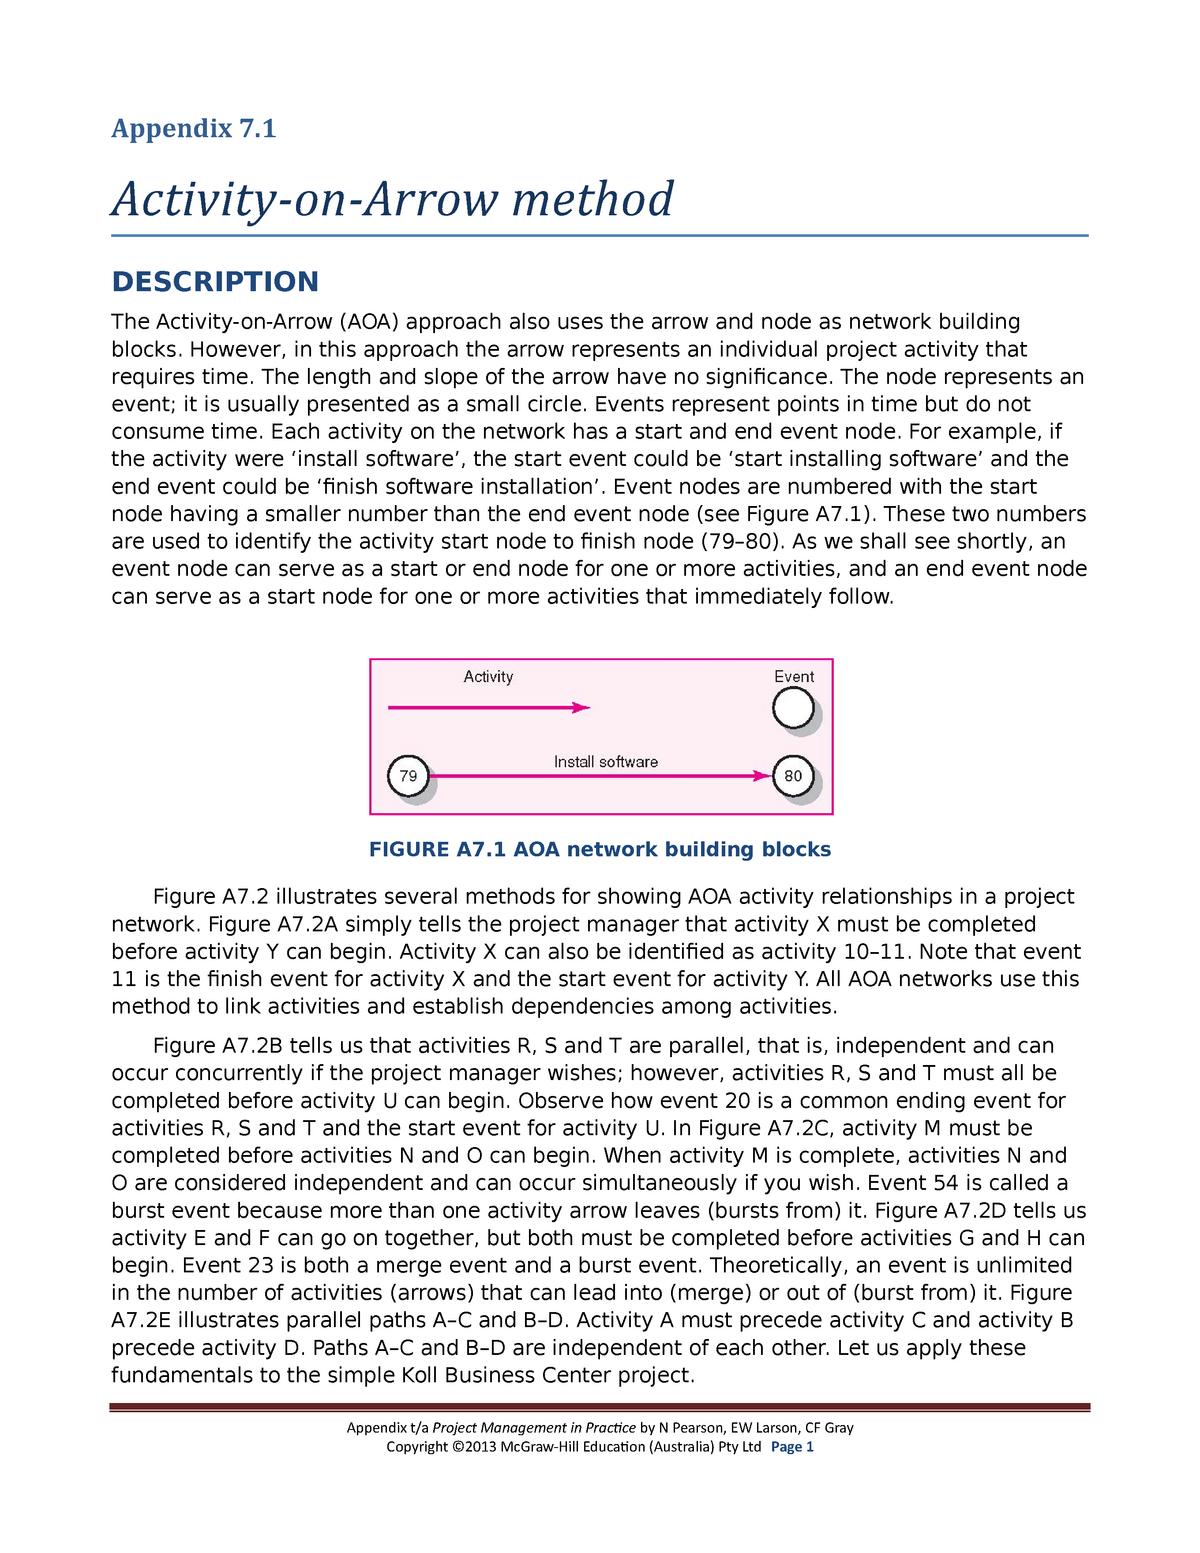 tutorial work - chapter 7 - activity-on-arrow method - 048260 : engineering  project management - studocu